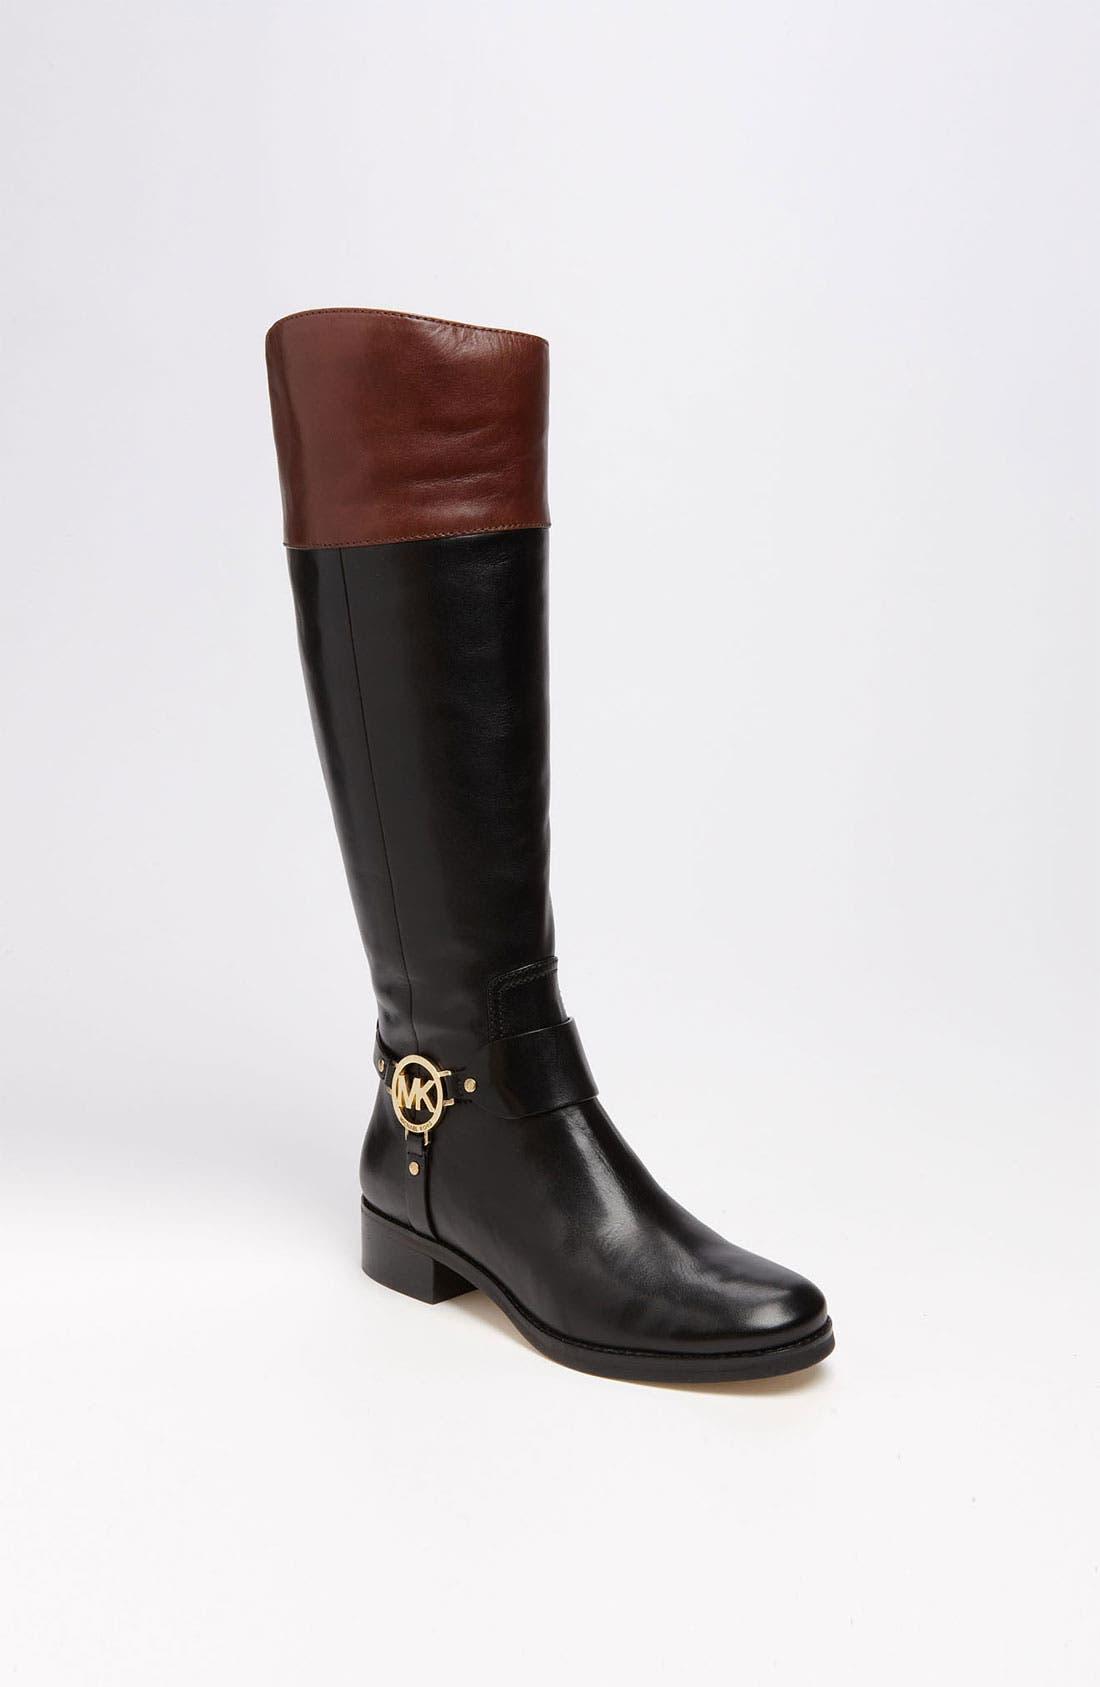 Alternate Image 1 Selected - MICHAEL Michael Kors 'Fulton' Harness Boot